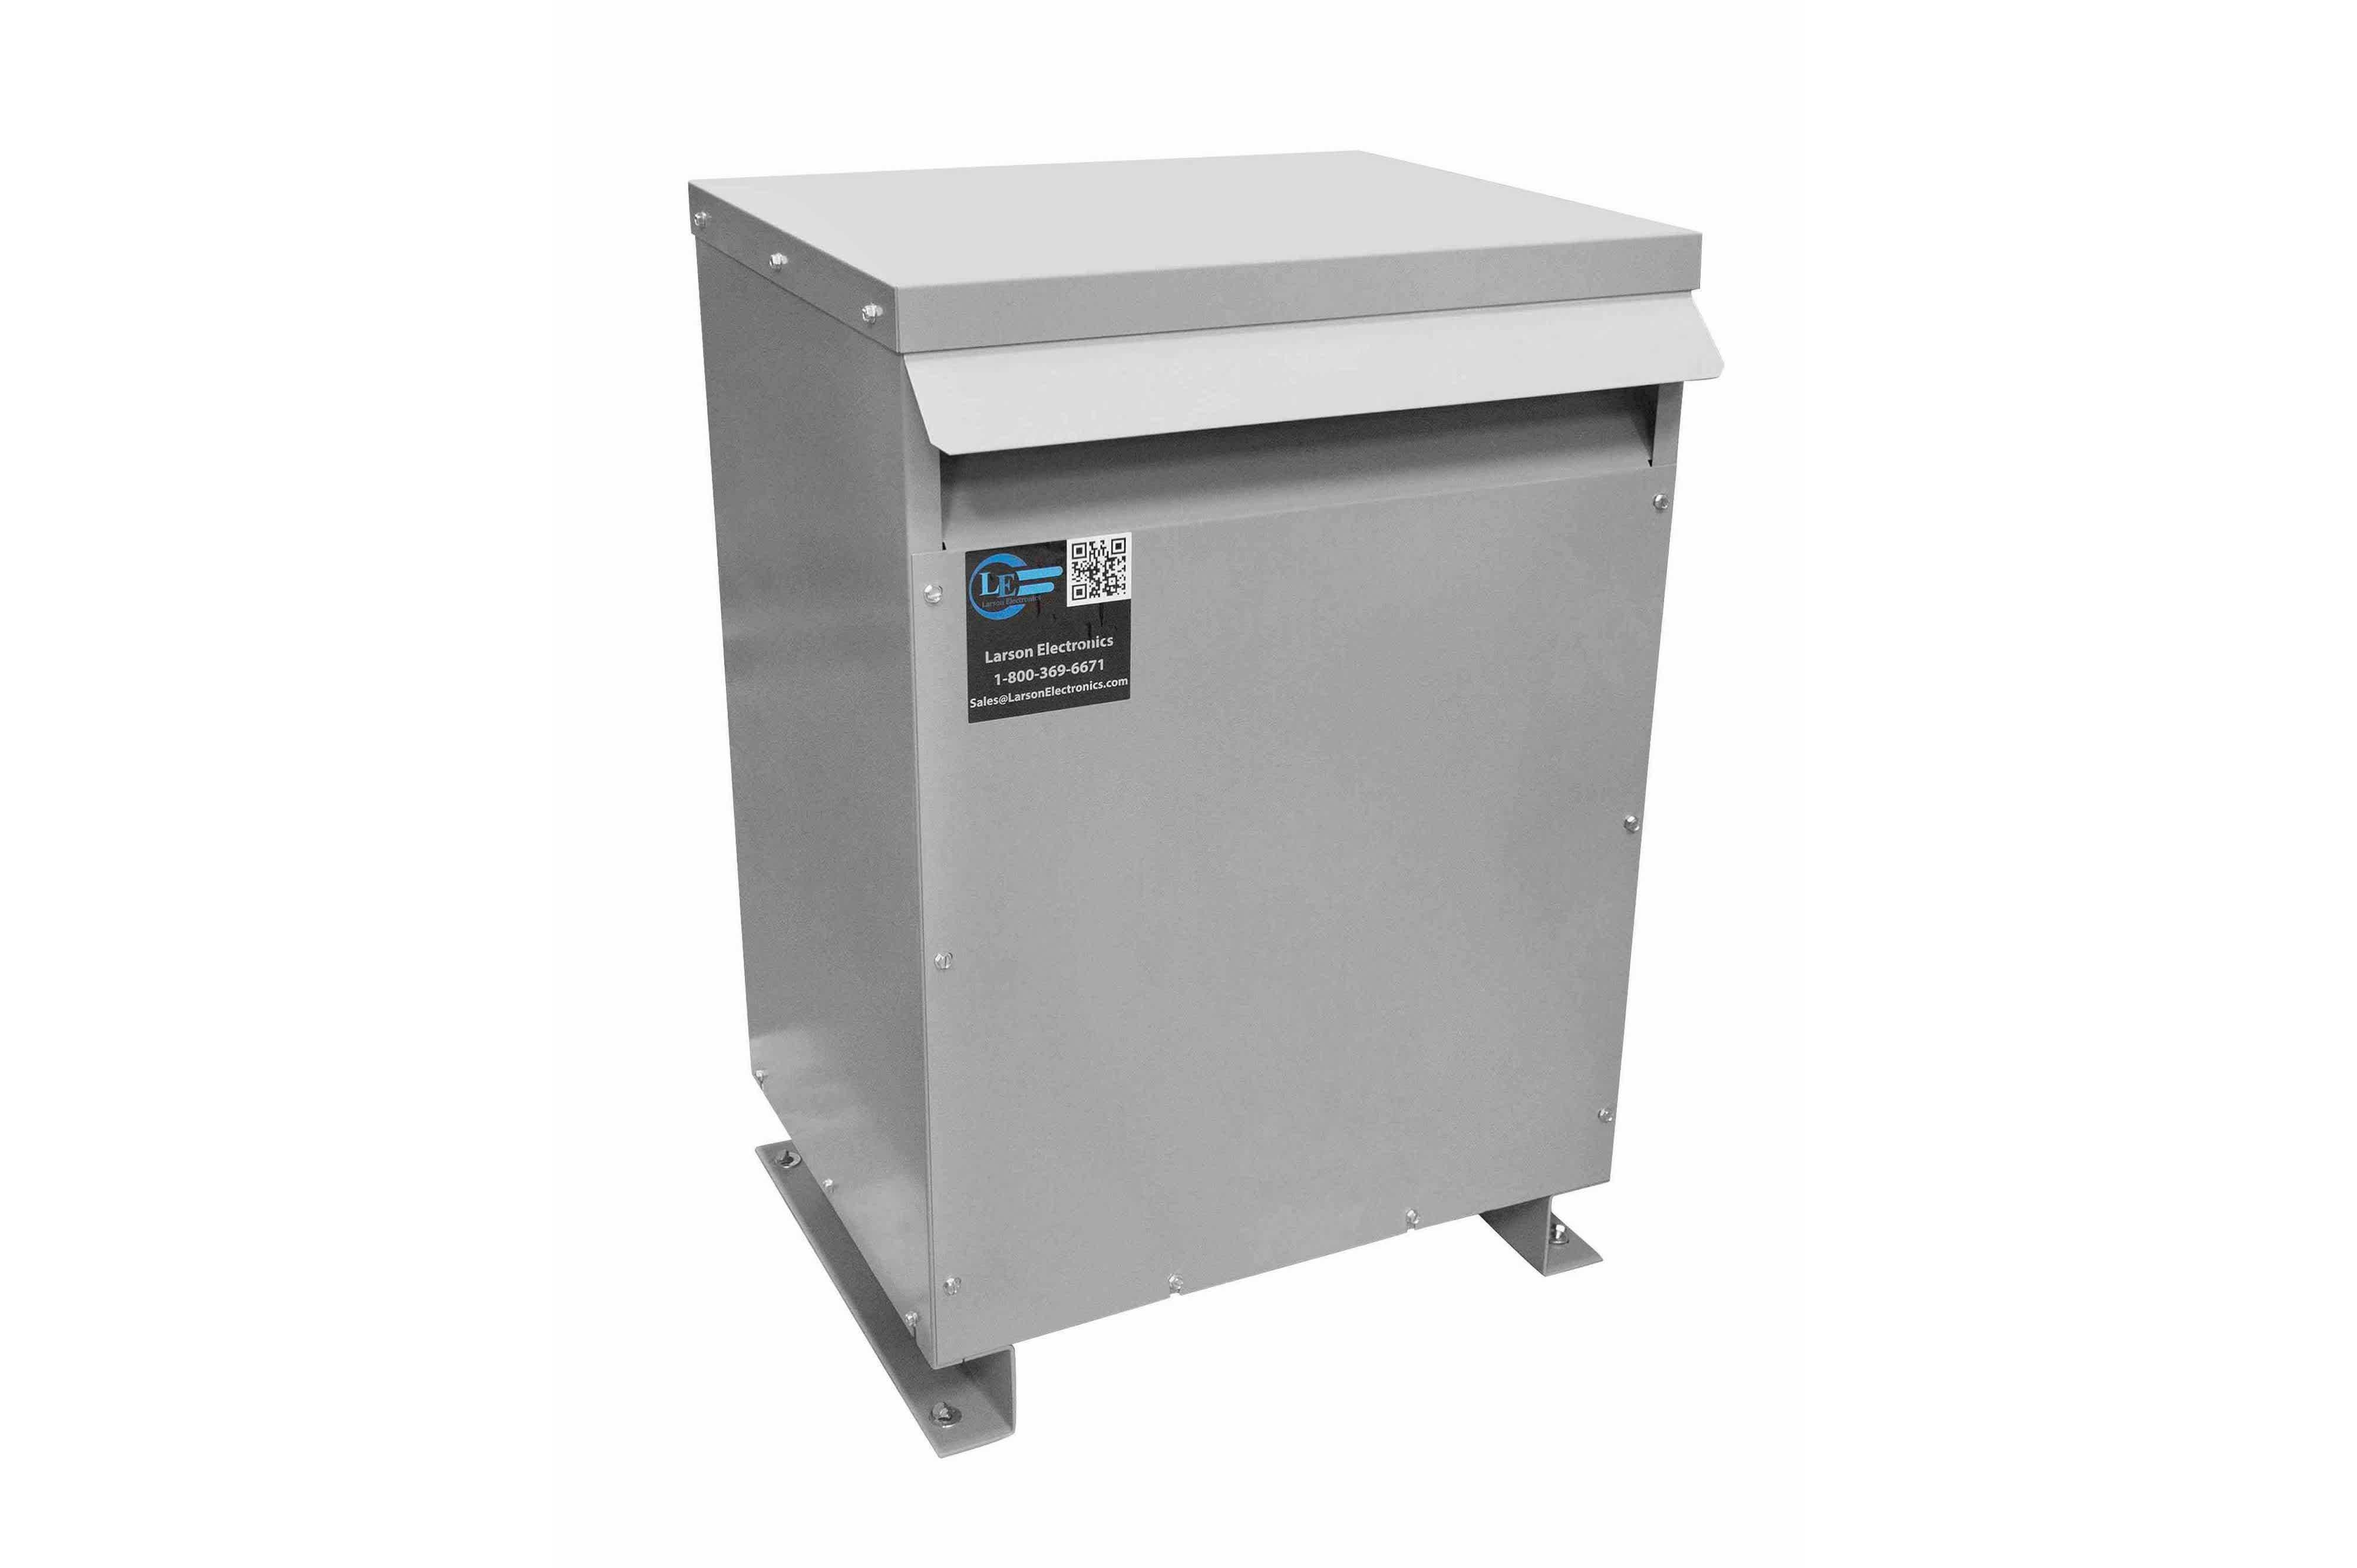 237.5 kVA 3PH Isolation Transformer, 480V Wye Primary, 415V Delta Secondary, N3R, Ventilated, 60 Hz